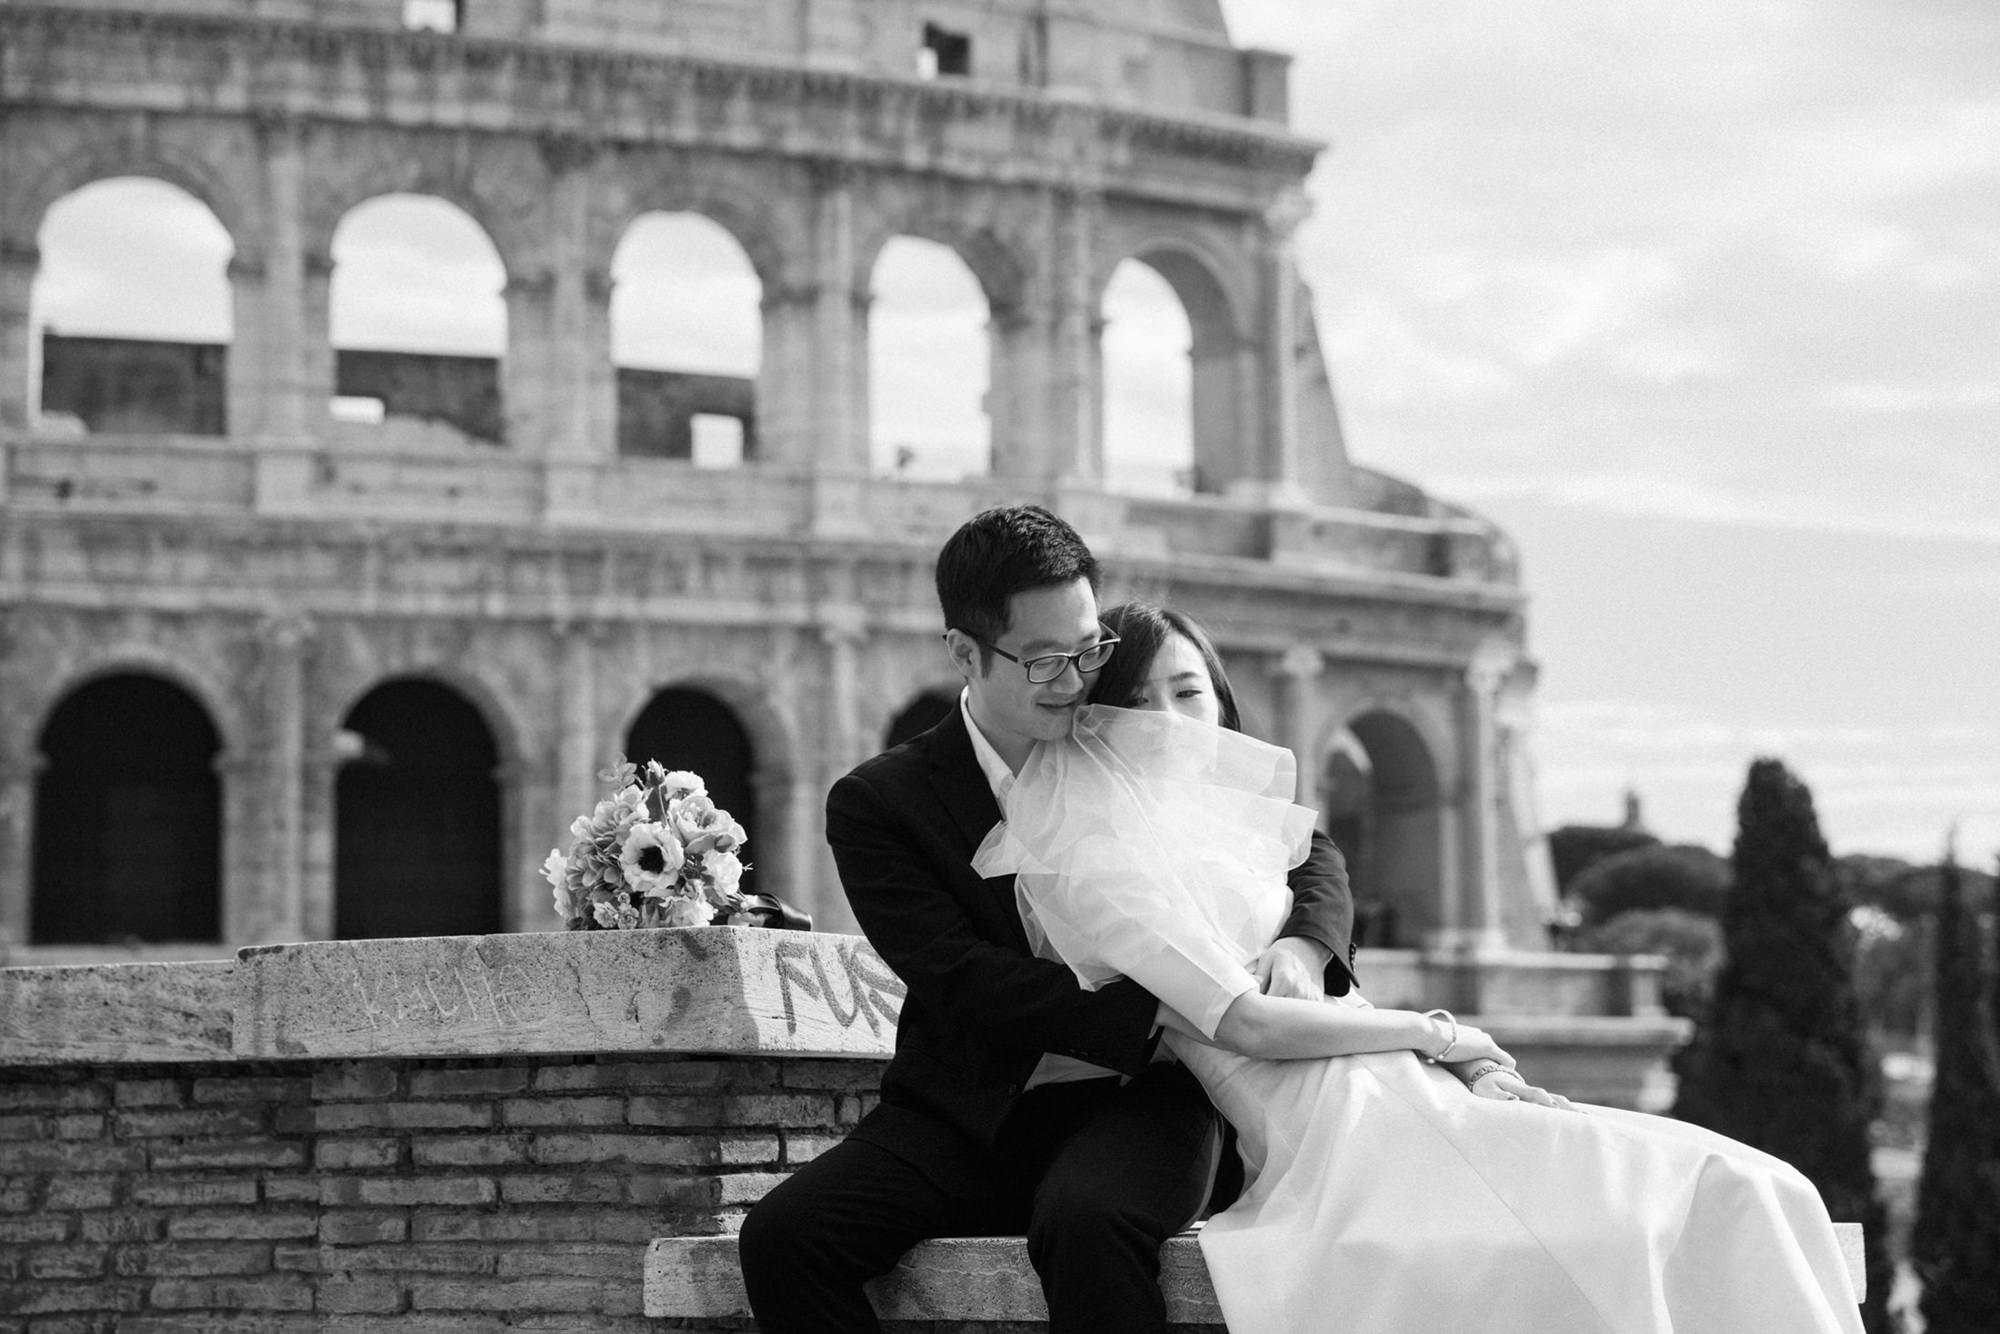 Weiyi & Xizhan by CHYMO & MORE Photography - Highlight-56.jpg